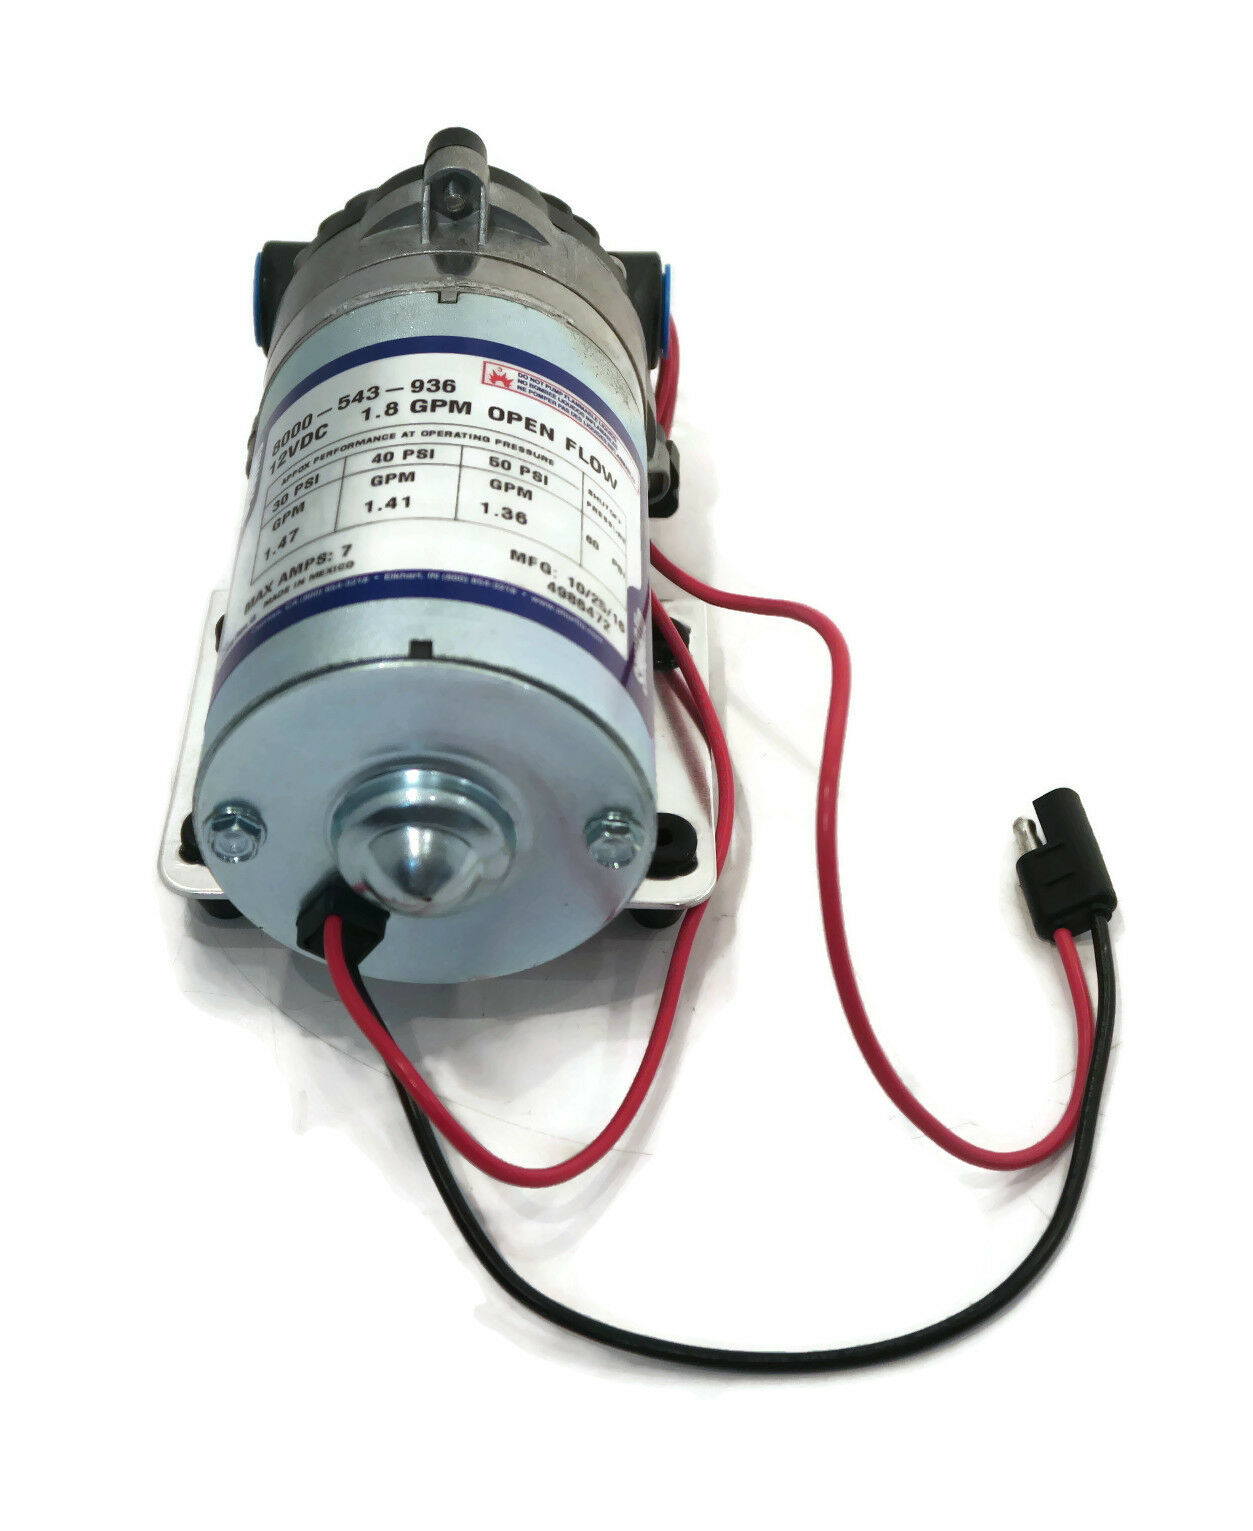 pump wire harness shurflo 12v volt demand water pump w/ wiring harness lawn ... #10